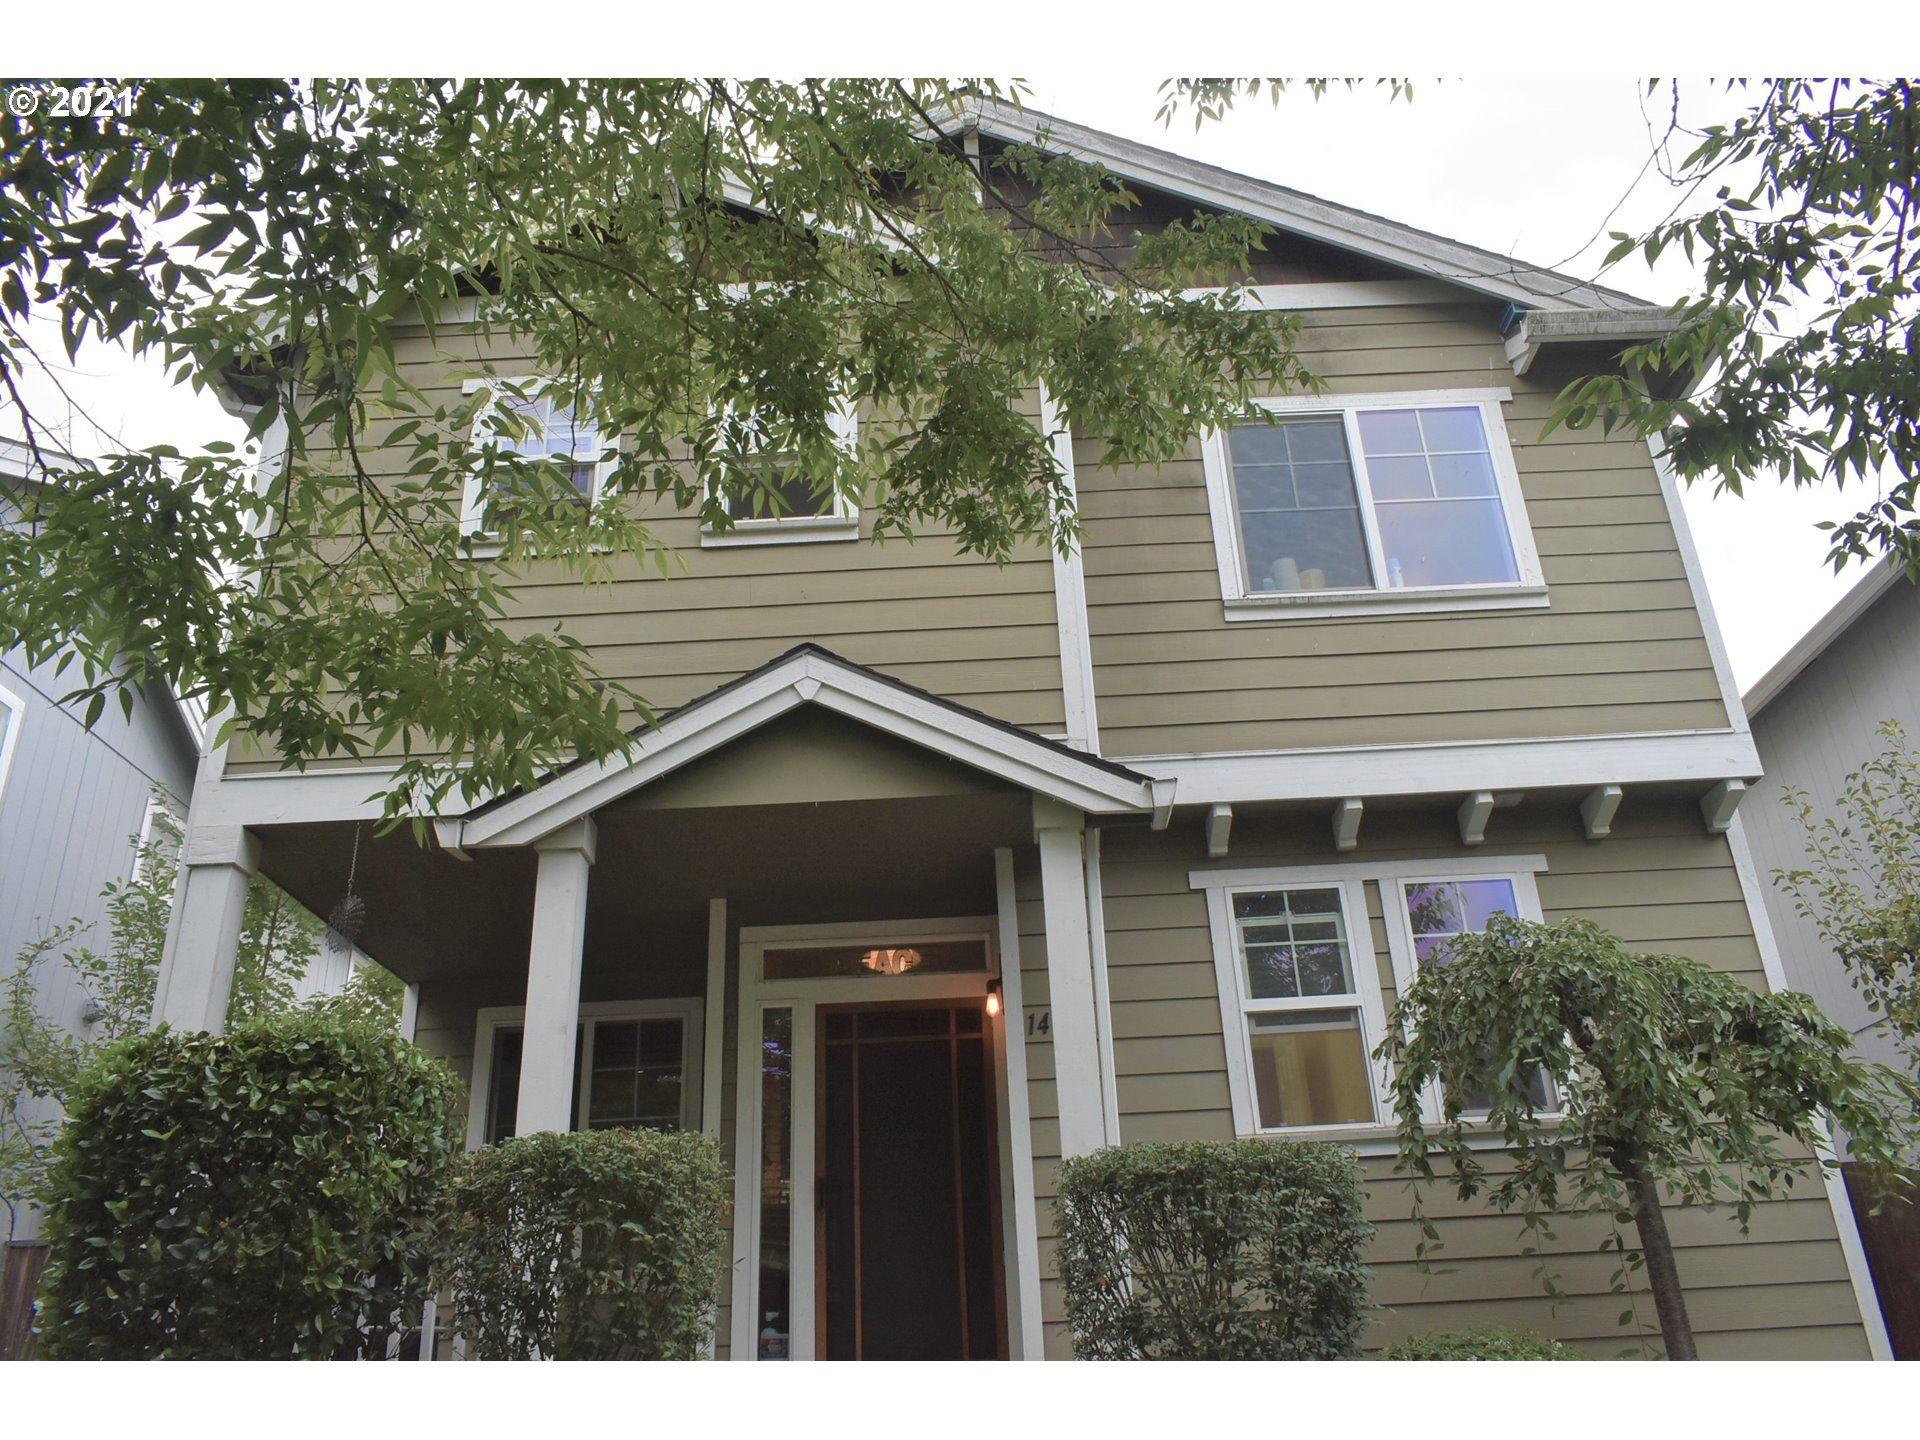 1468 SE BLANCHARD ST, Hillsboro, OR 97123 - MLS#: 21538249